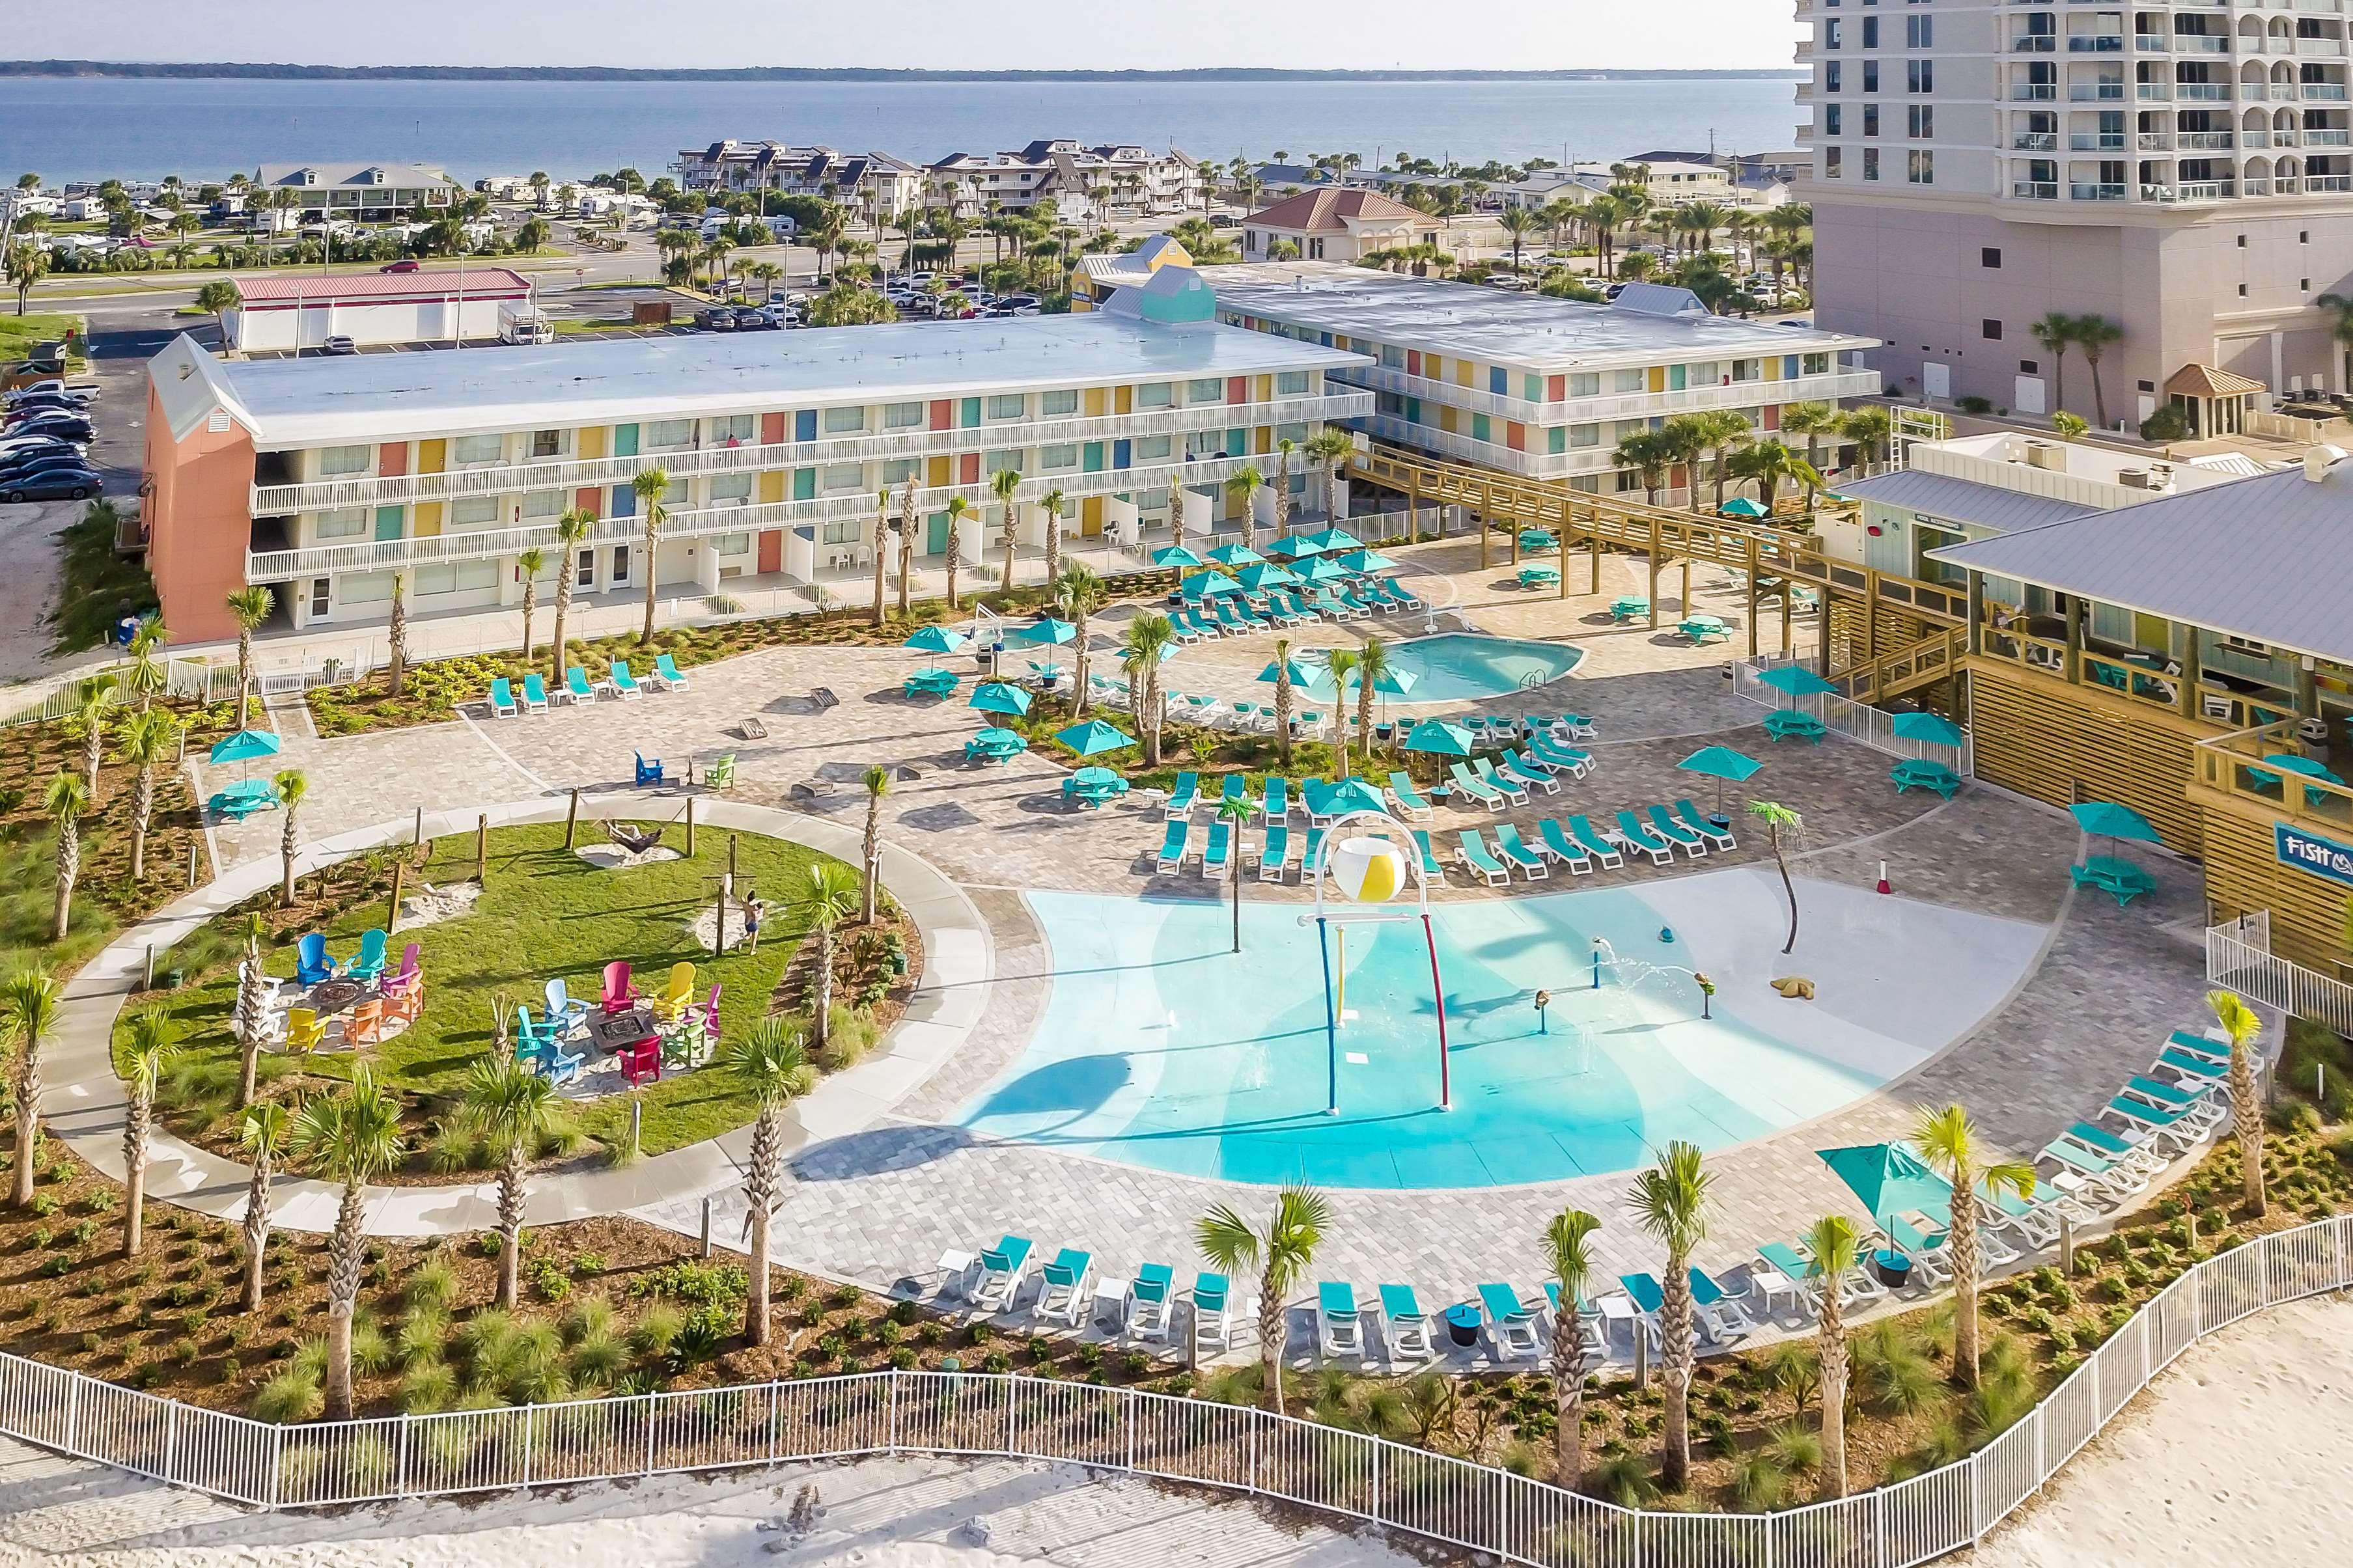 Best Western Beachside Resort image 1